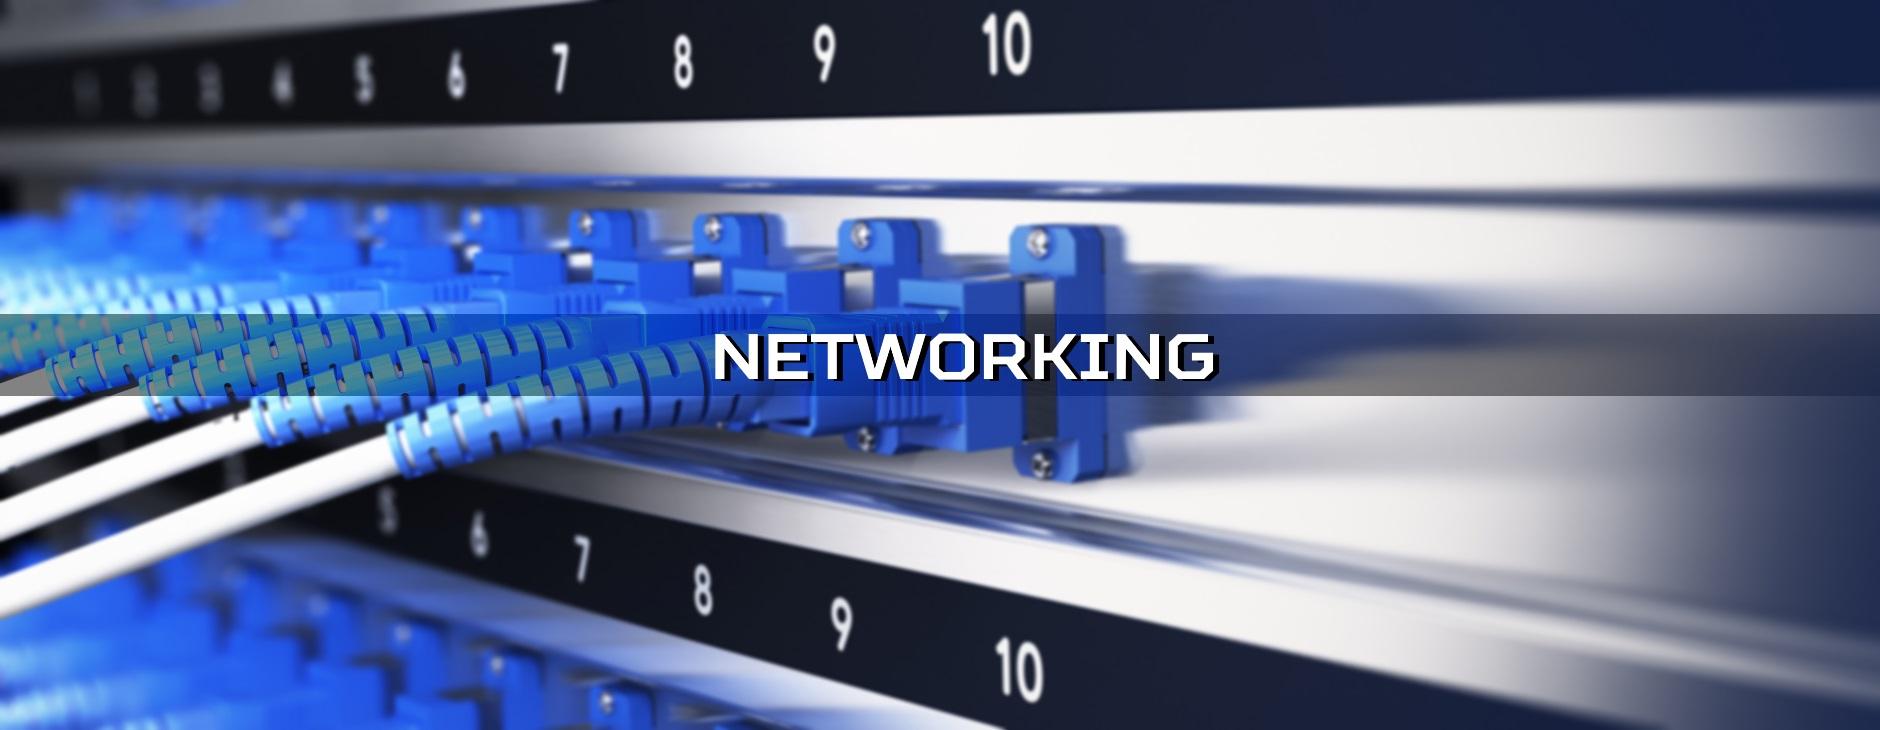 Networking-3.jpg